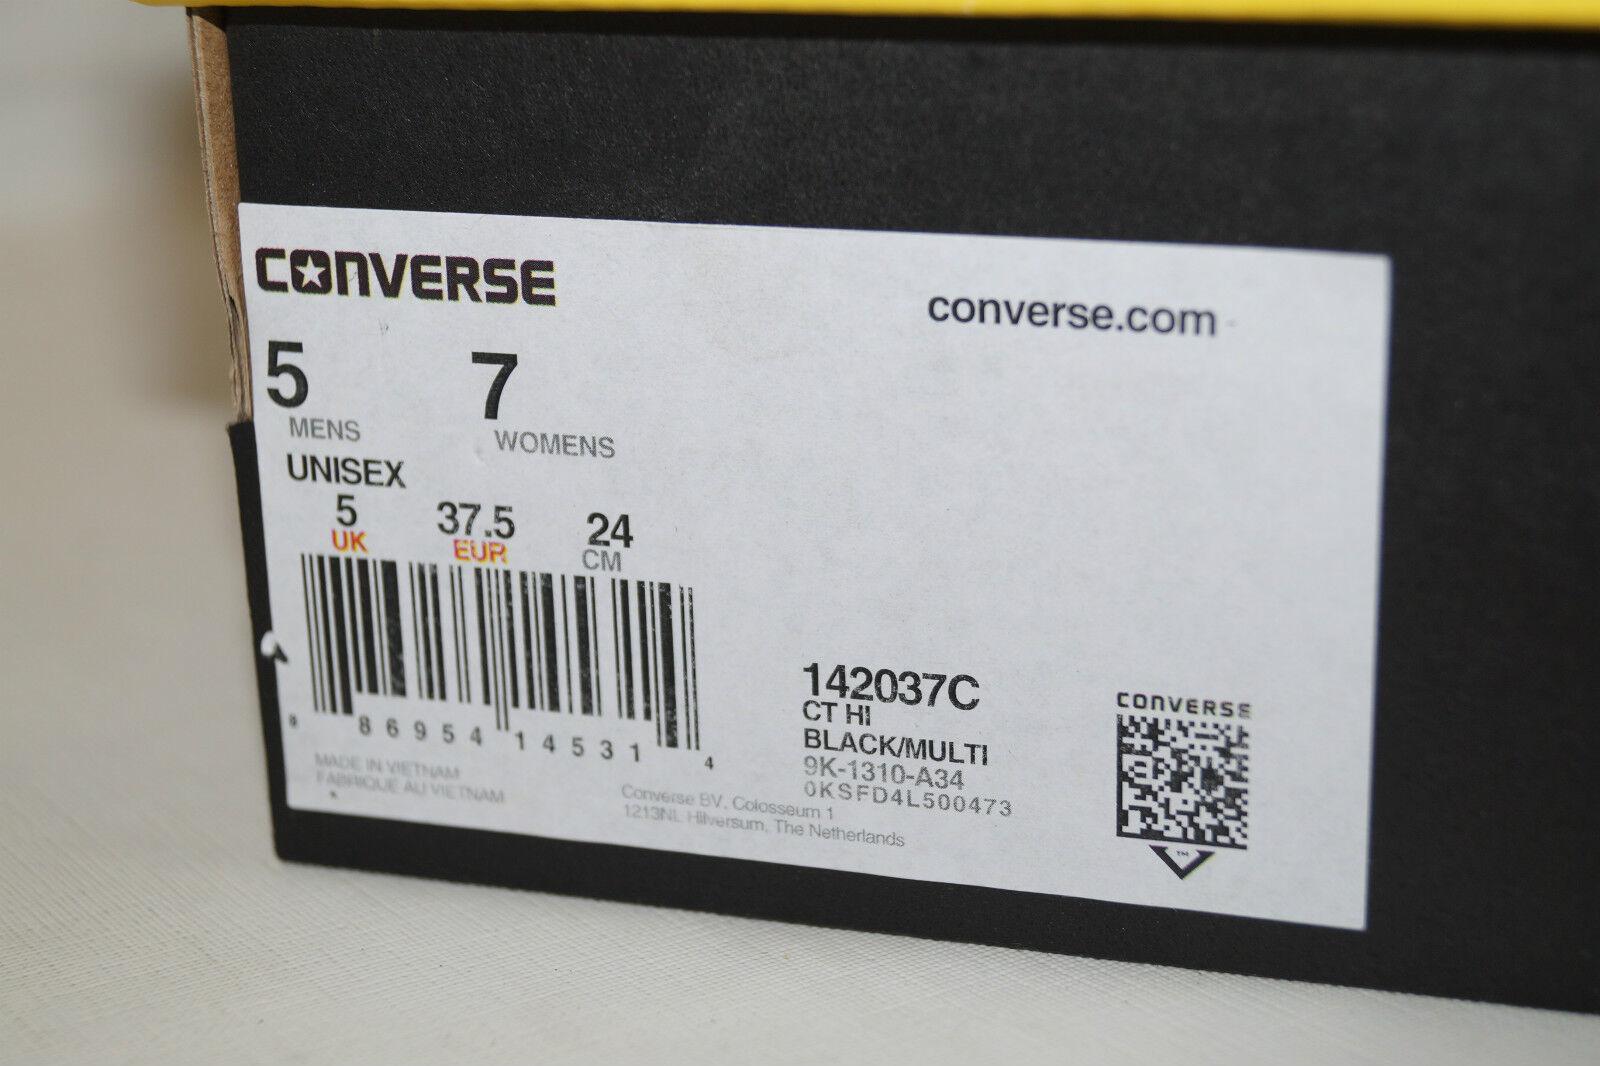 CONVERSE CHUCKS ALL STAR HIGH Gr.37,5 UK 5 5 UK  HI BARTMAN SIMPSONS 142037C e7a48b